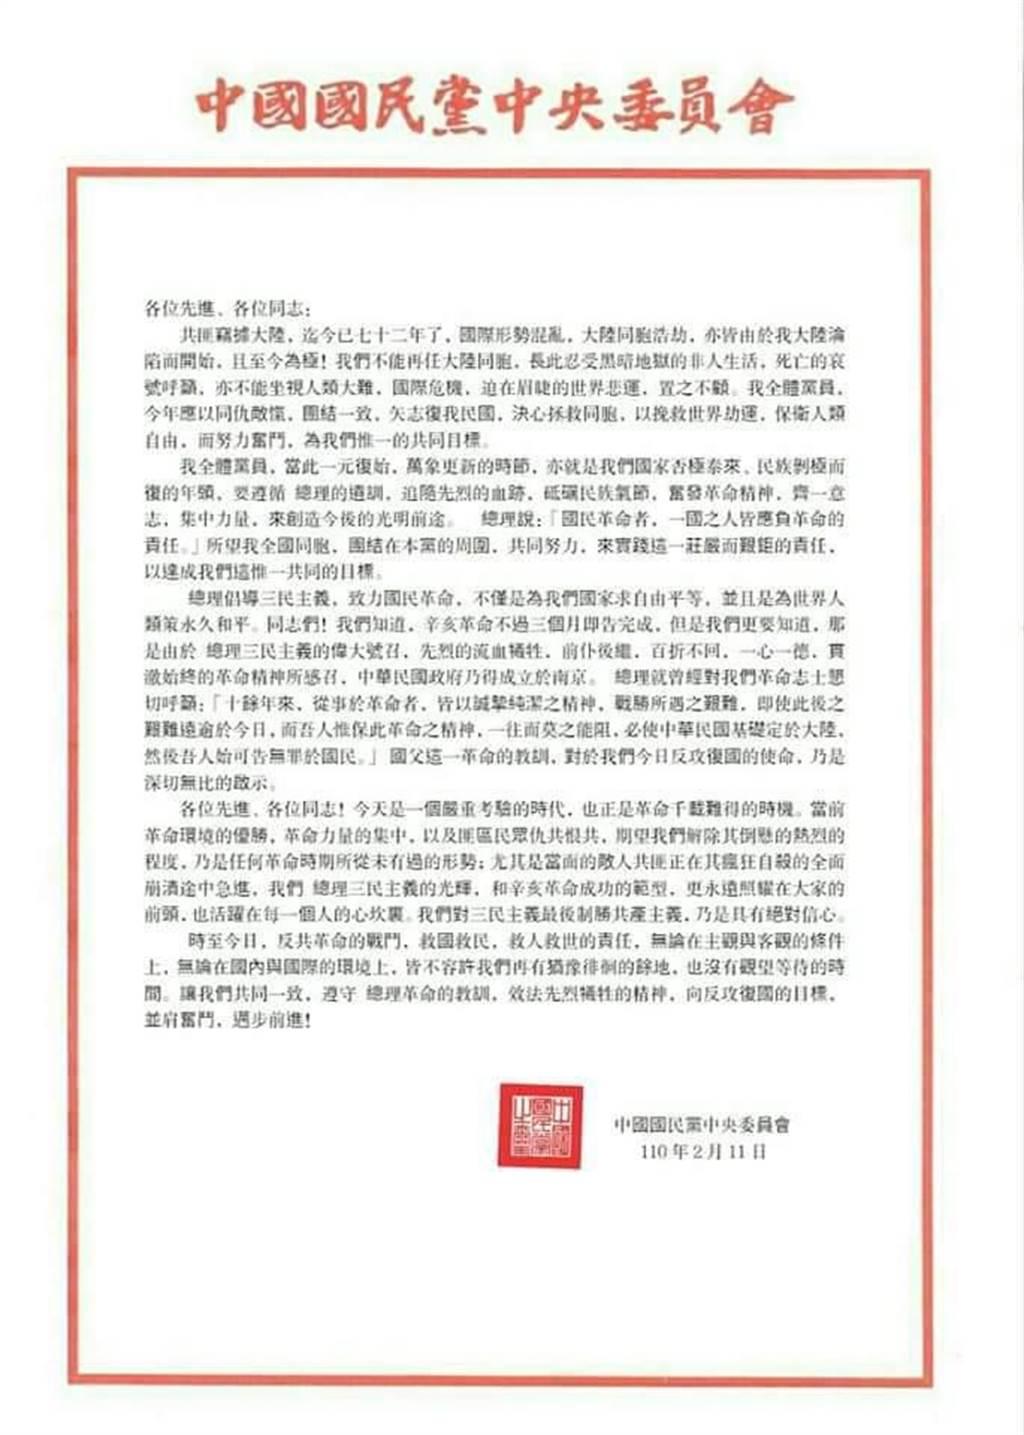 Re: [新聞] 網傳國民黨反共復國信函 國民黨:不實訊息